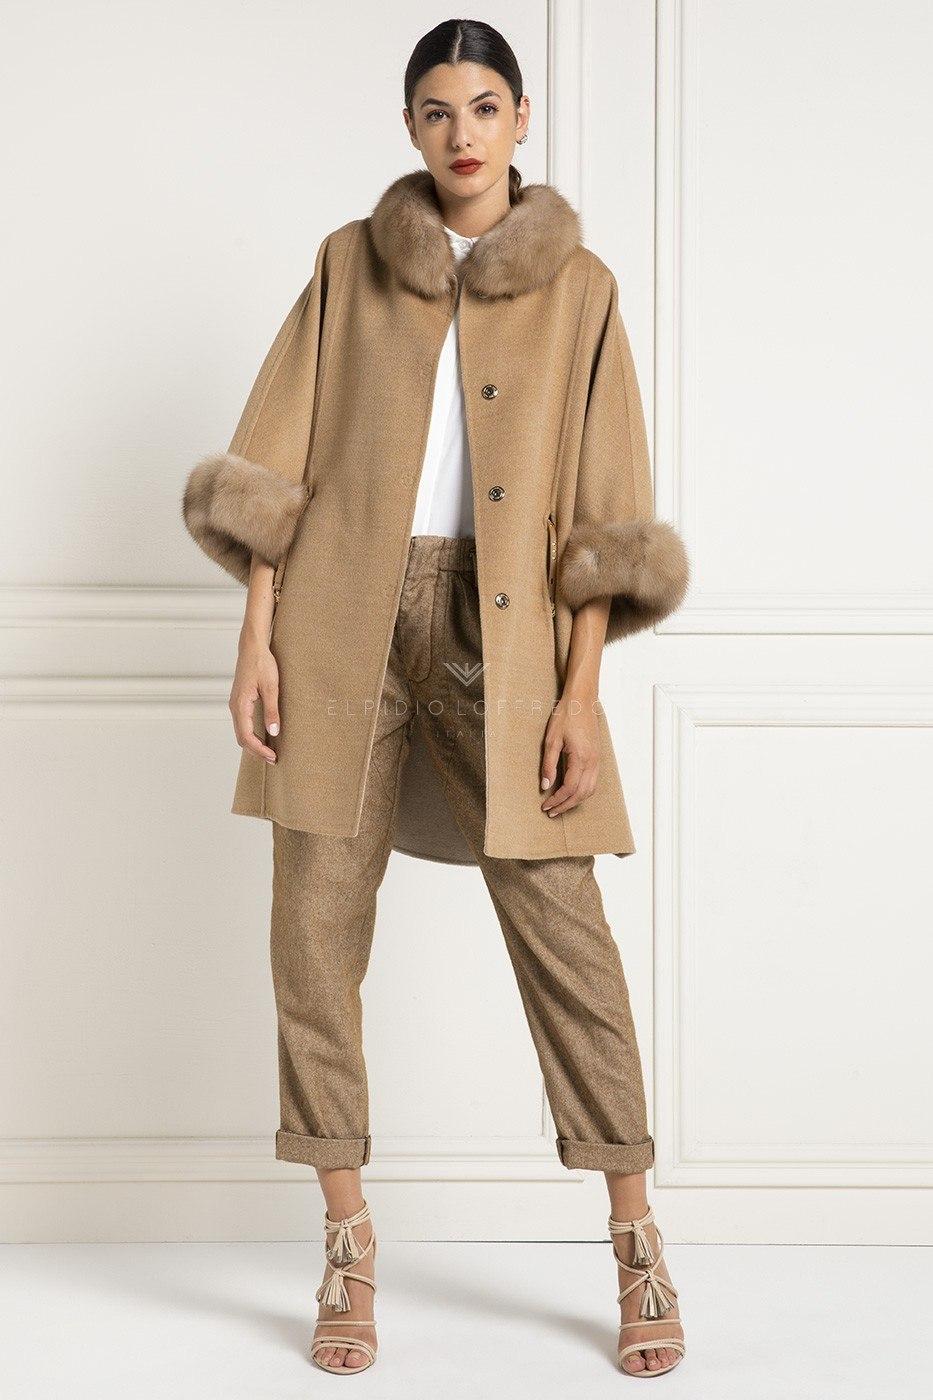 Cashmere Loro Piana Coat with Sable Fur – Length 85 cm